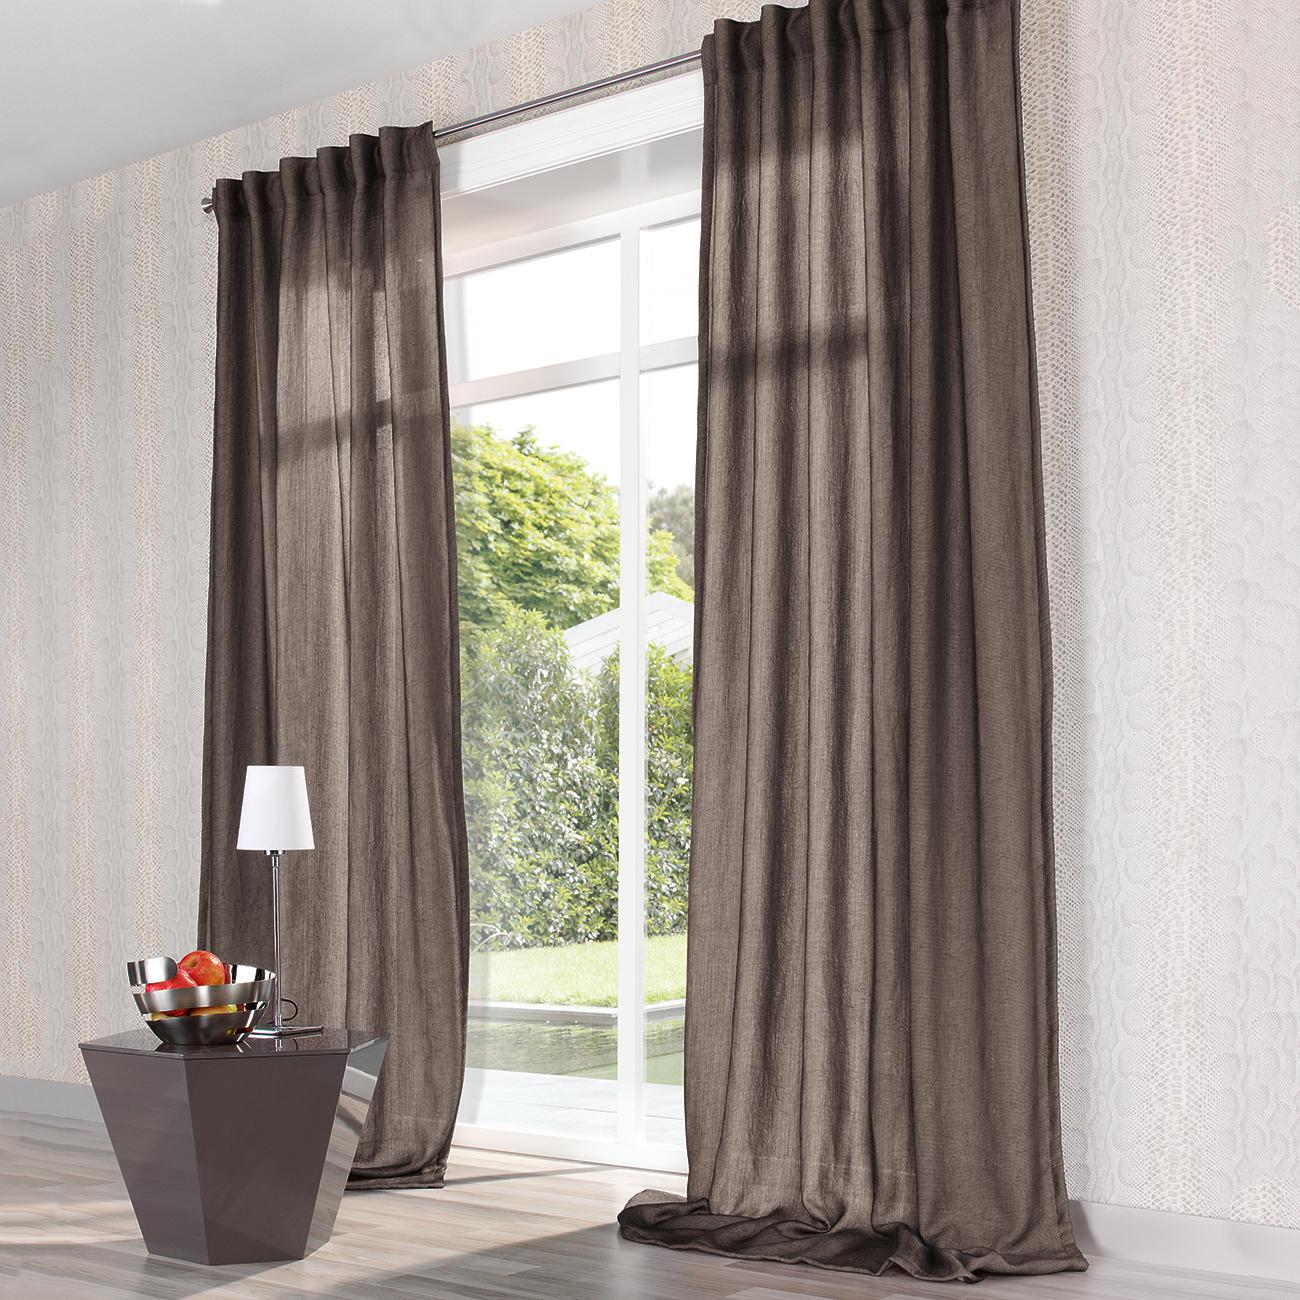 vorhang mirage 1 st ck vorh nge kaufen das kavaliershaus. Black Bedroom Furniture Sets. Home Design Ideas